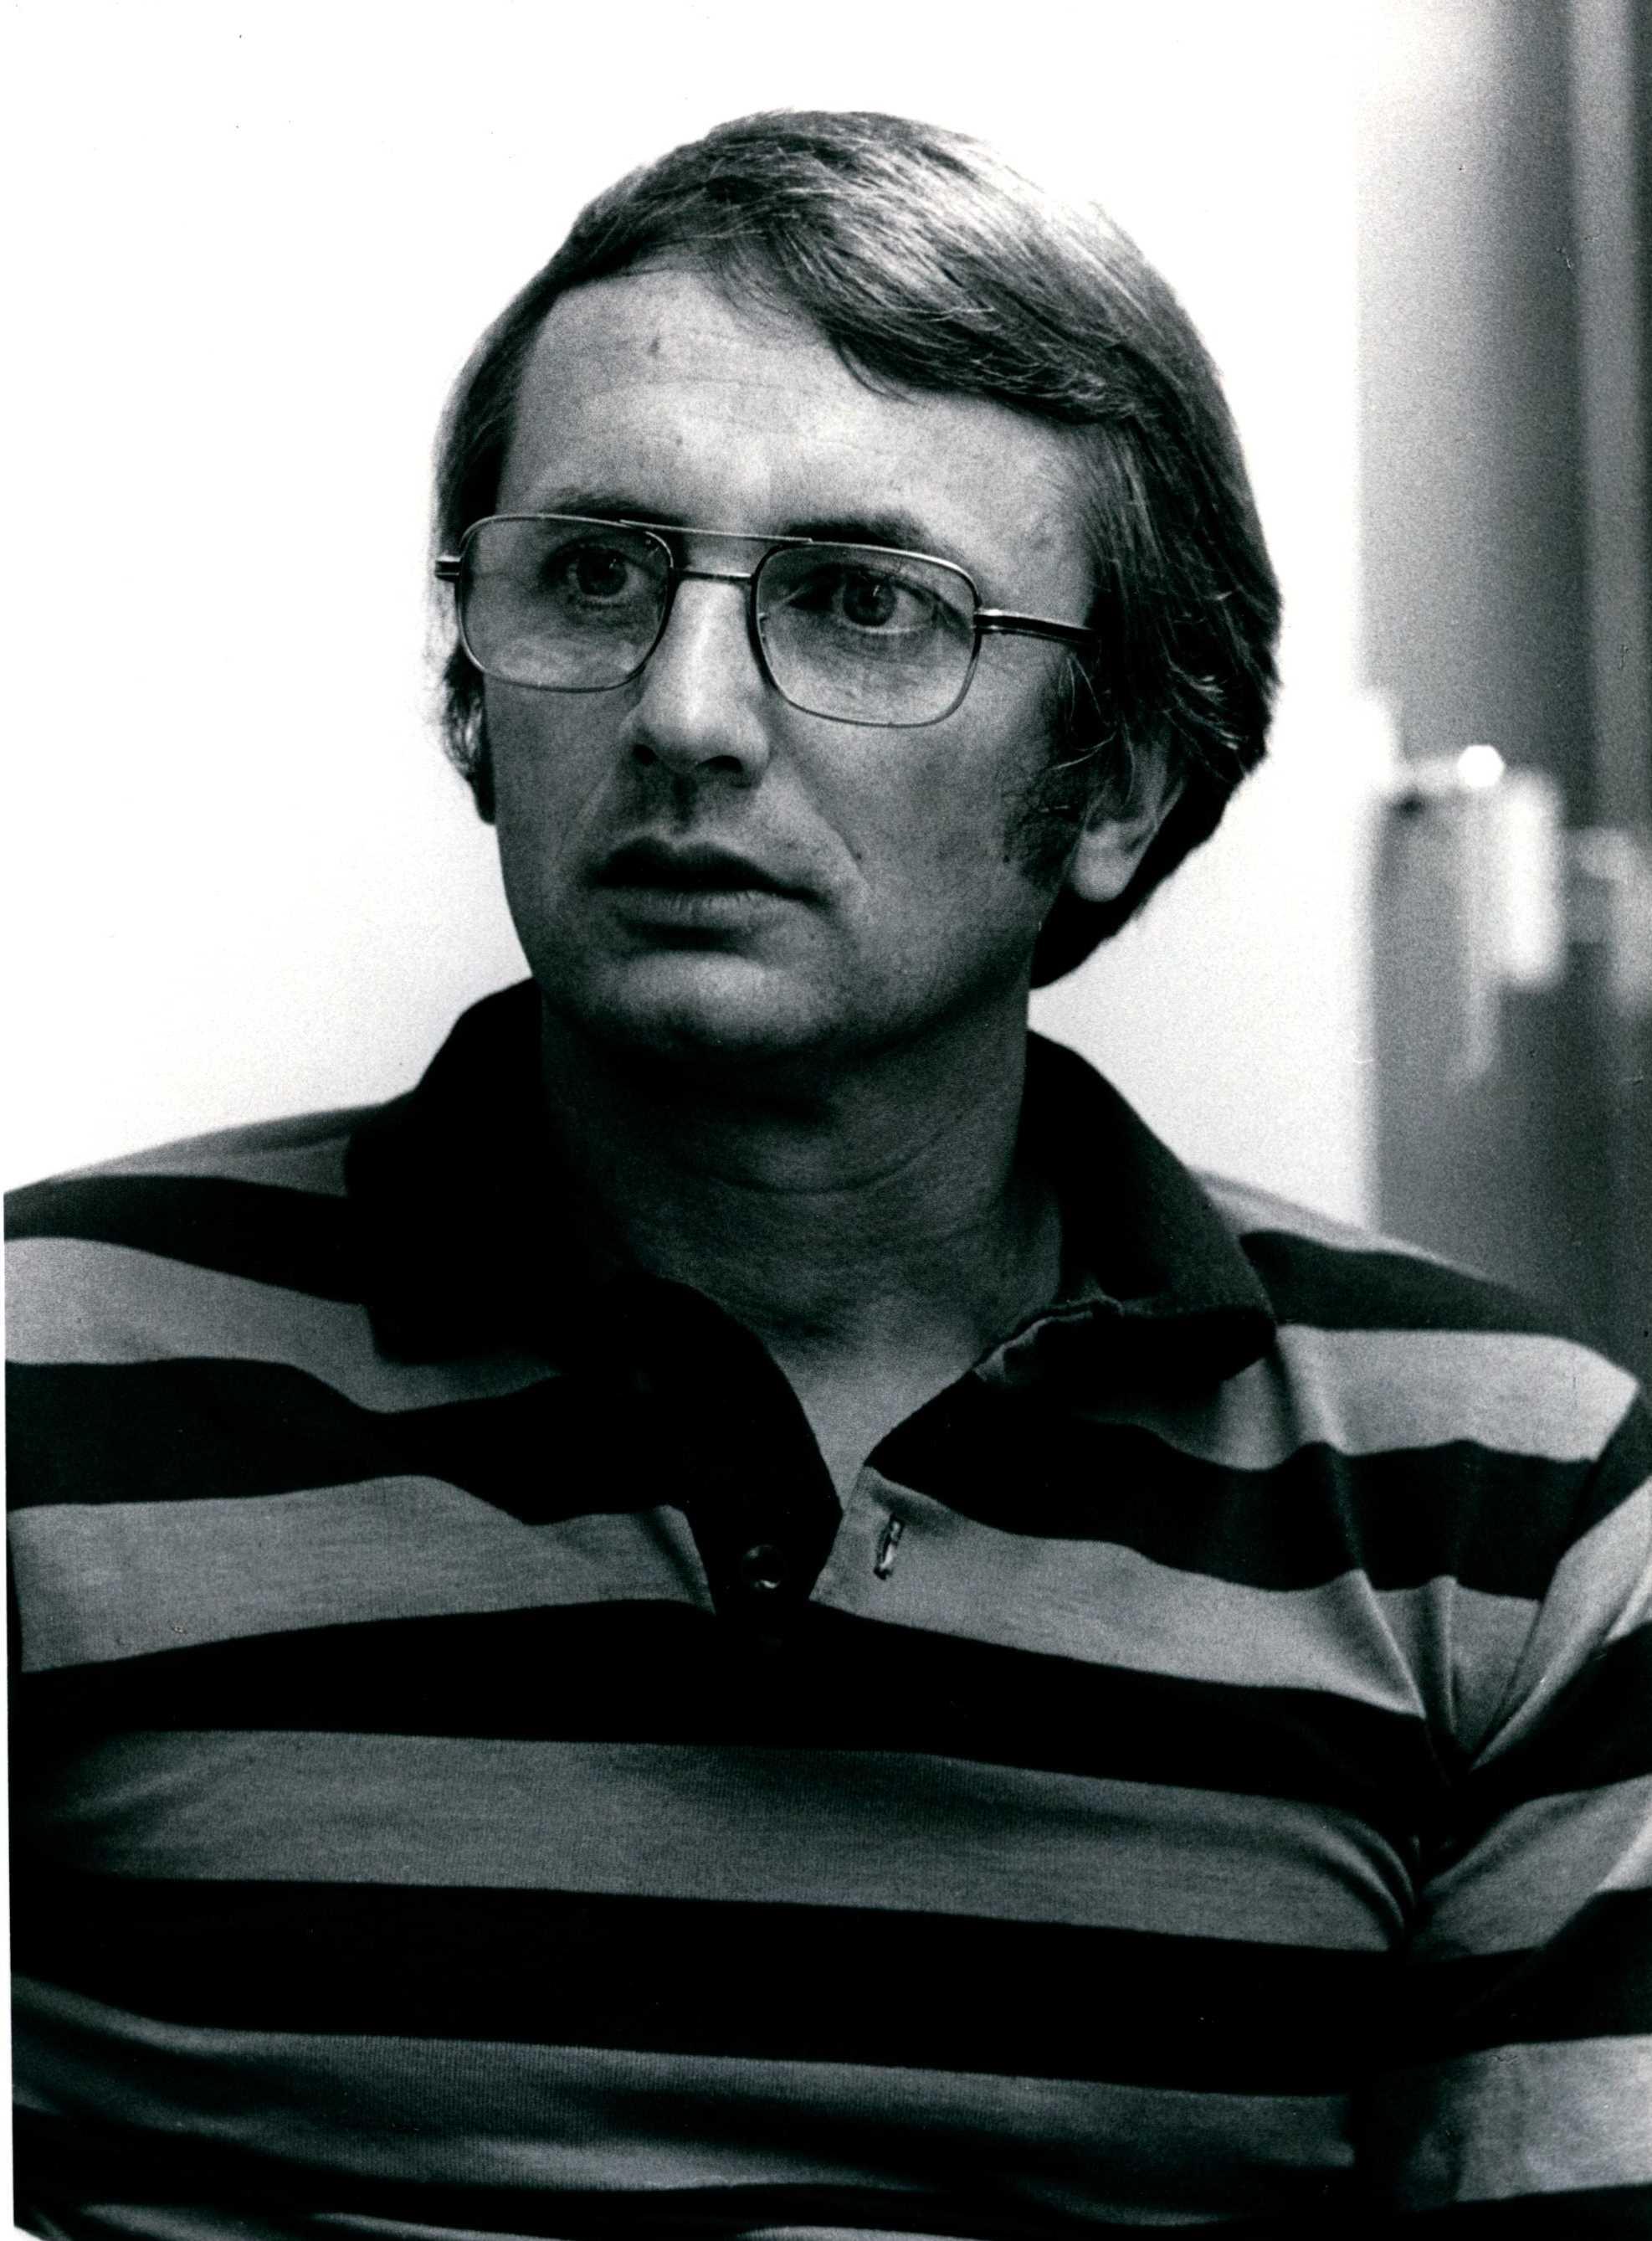 image of Scott A. Mori